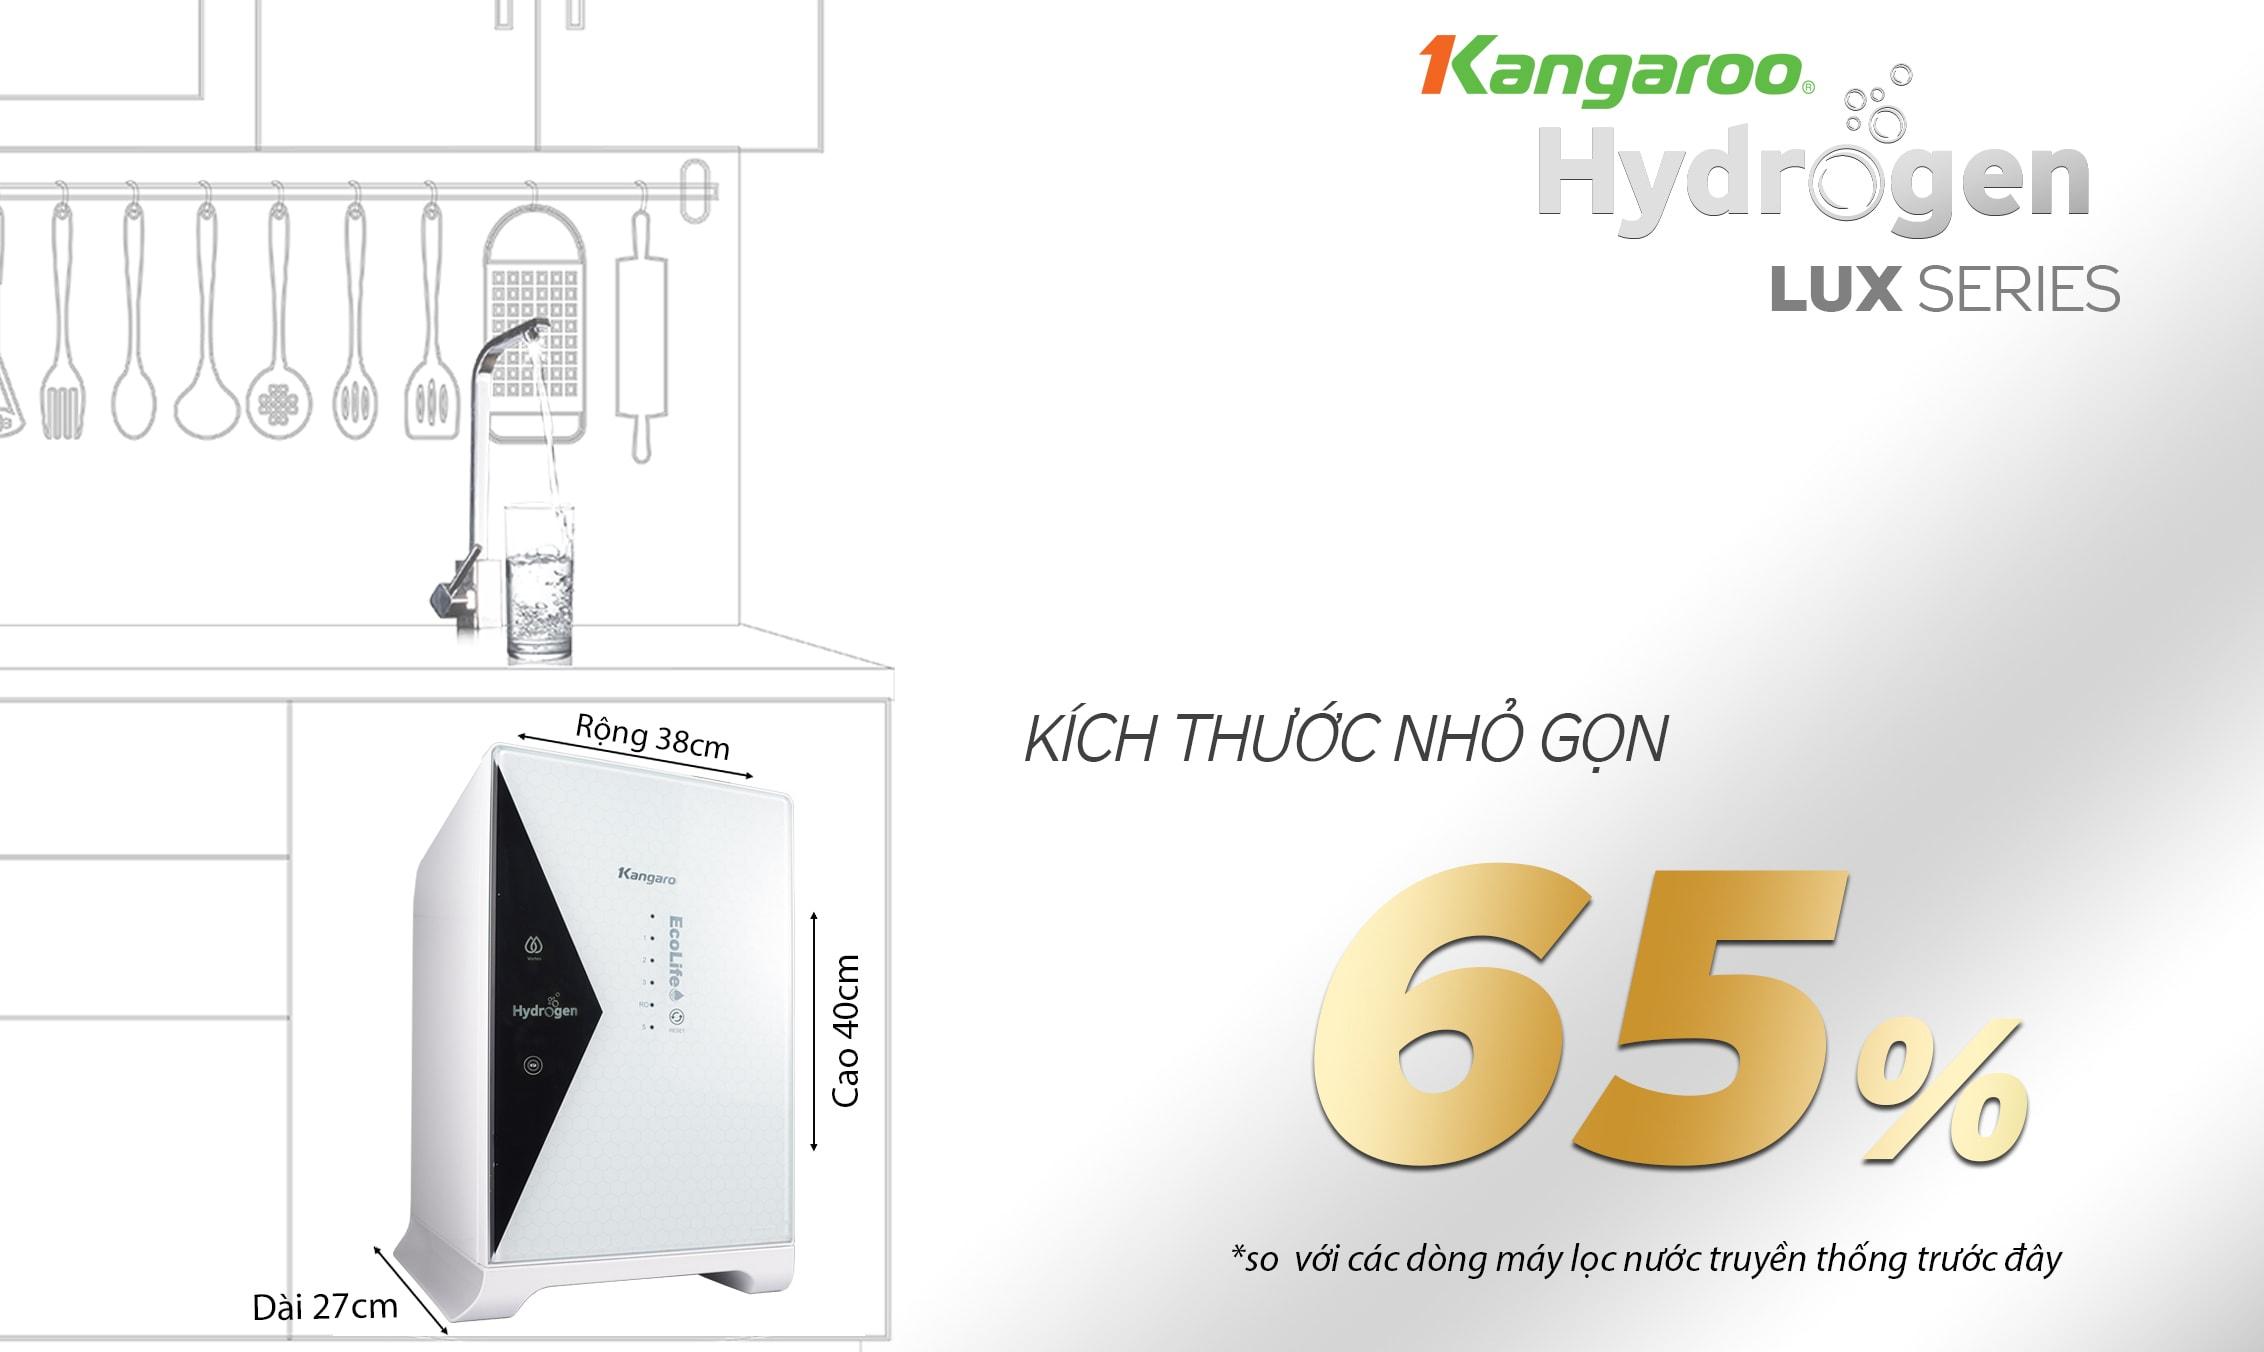 Thiet-ke-May-loc-nuoc-Kangaroo-Hydrogen-LUX-Serires-KG100HU--min